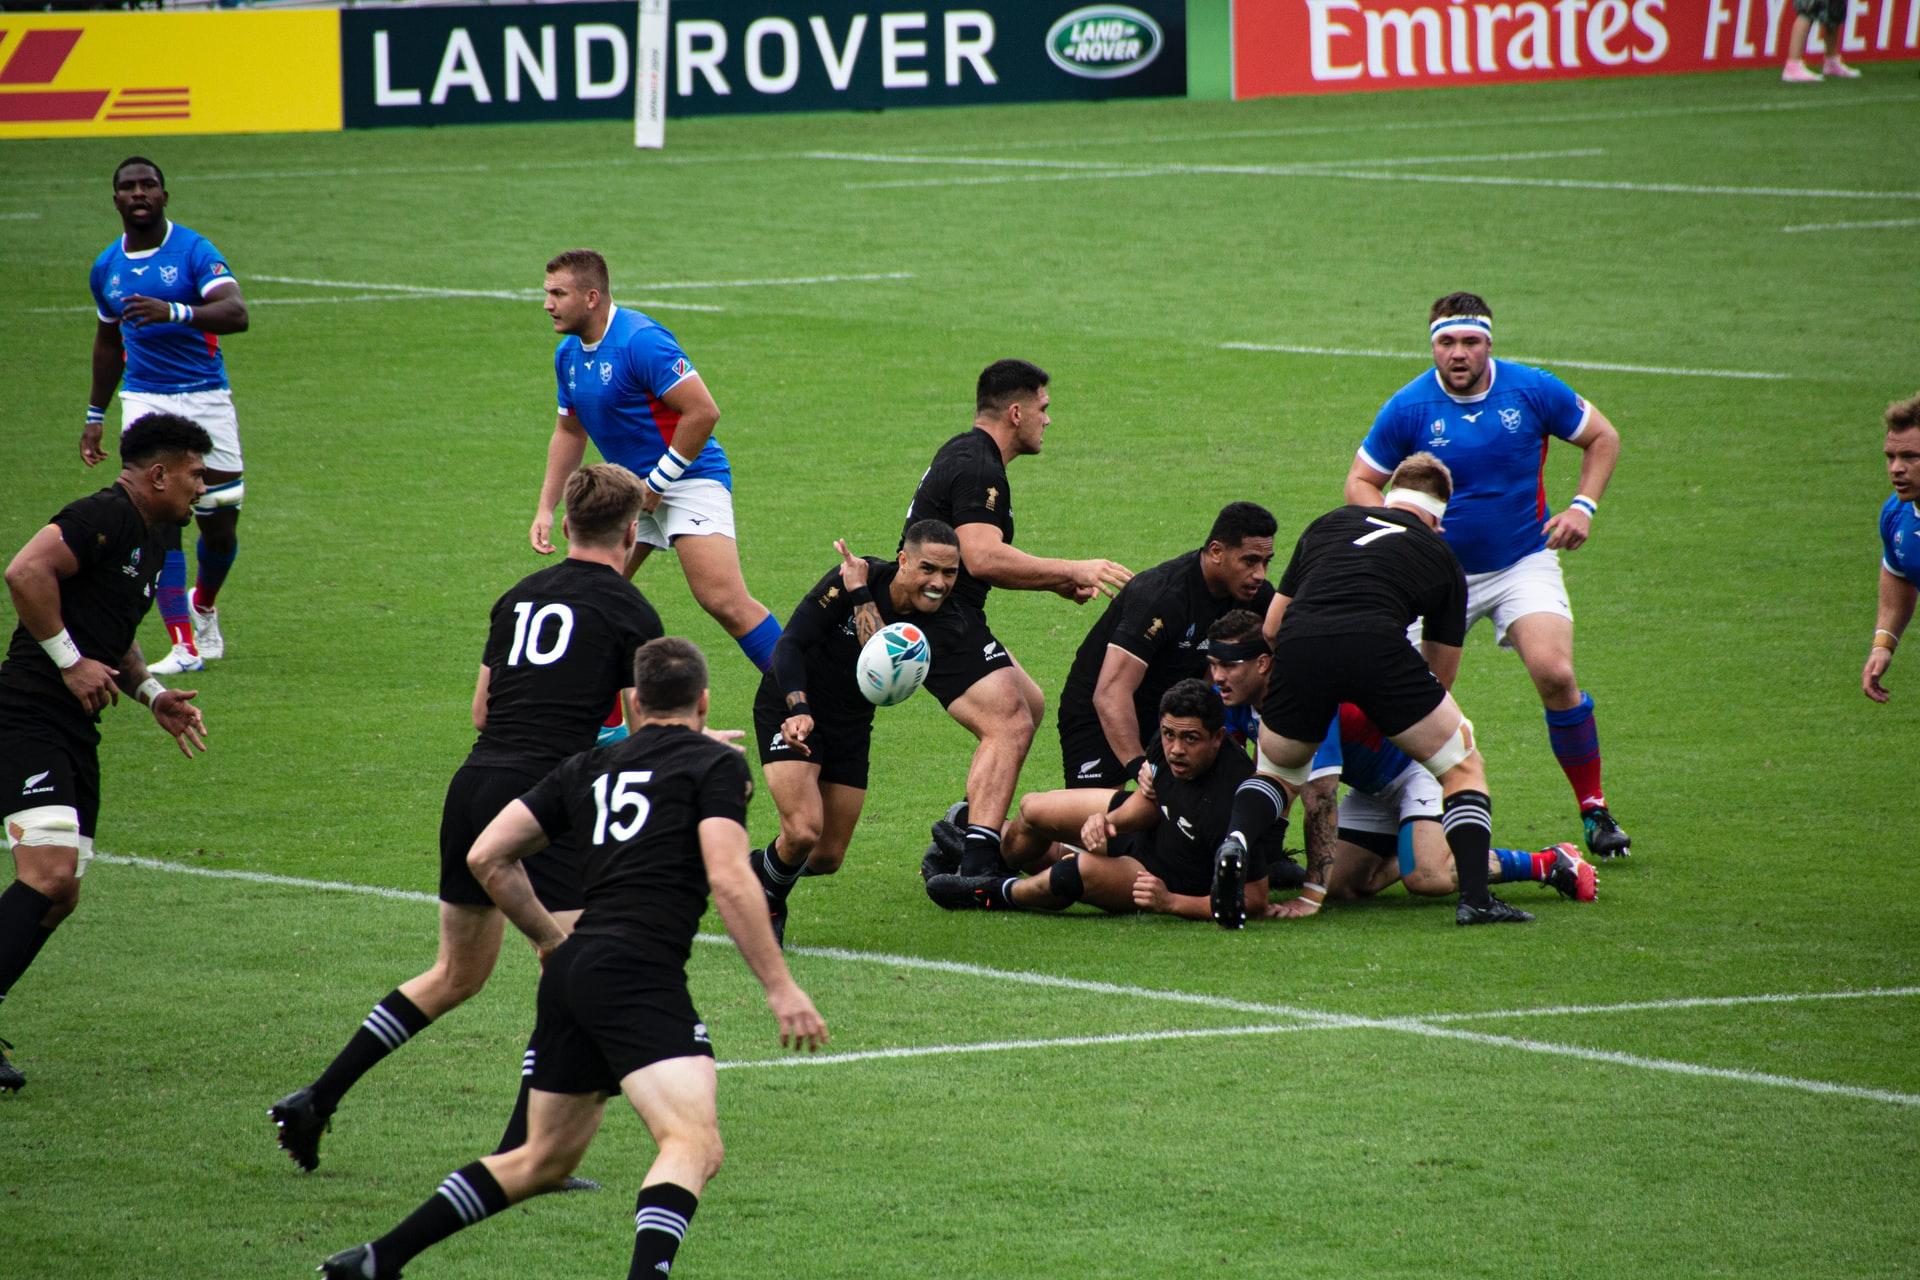 Rugby by Stefan Lehner